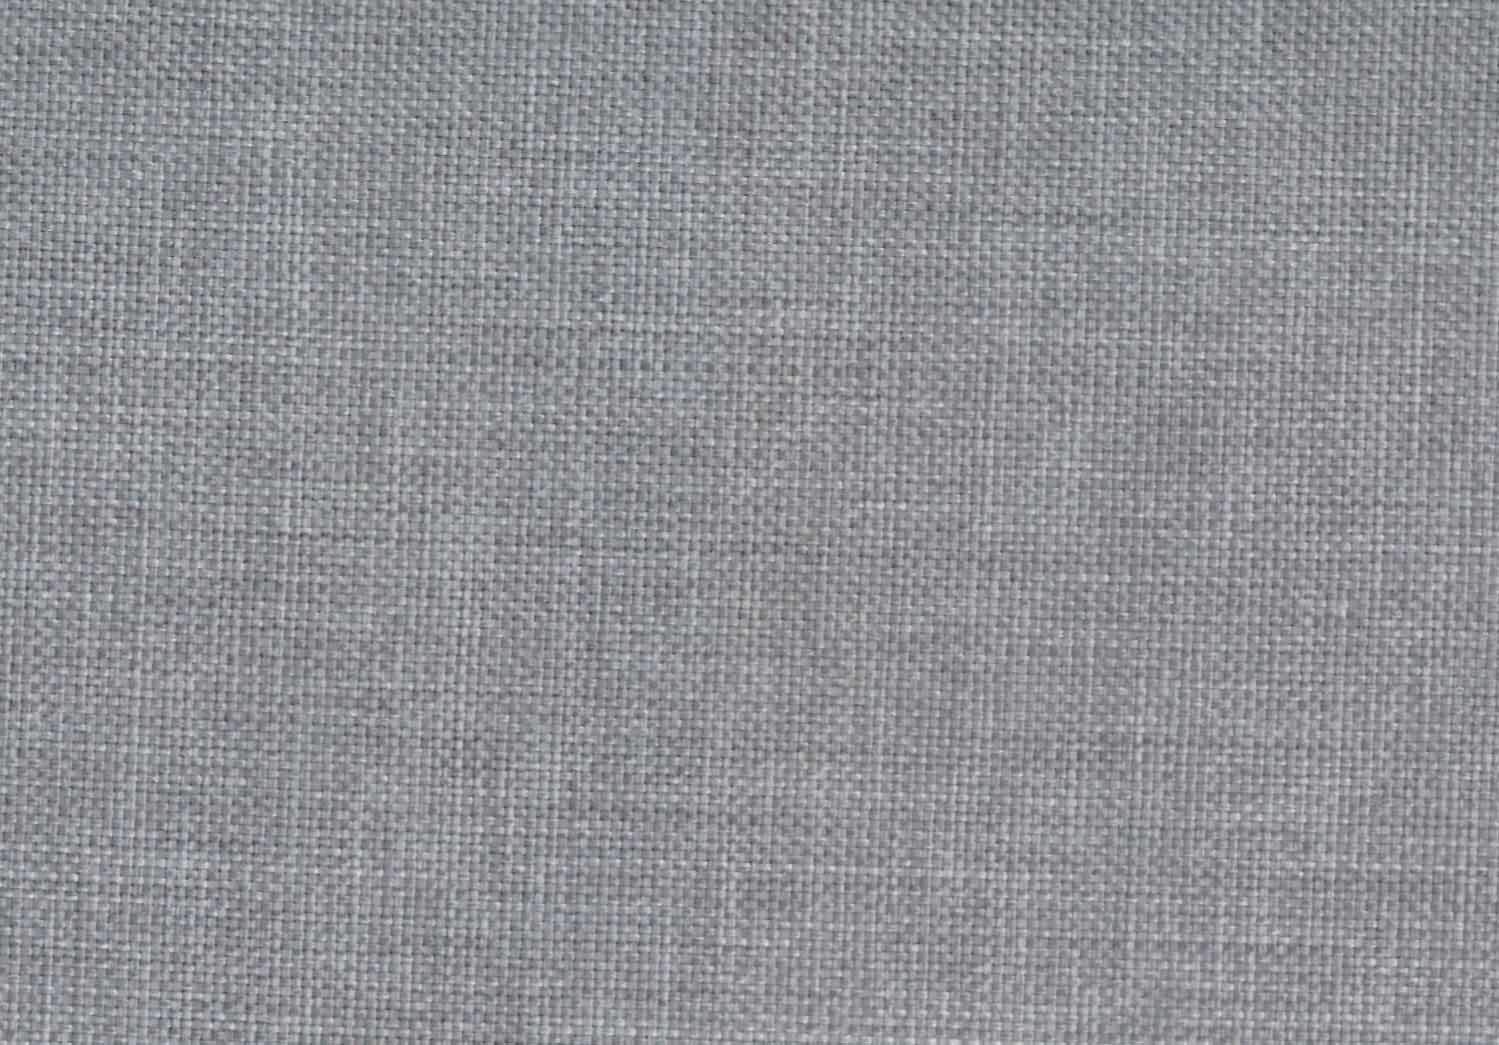 Grey linen wallpaper wallpapersafari for Gray textured wallpaper